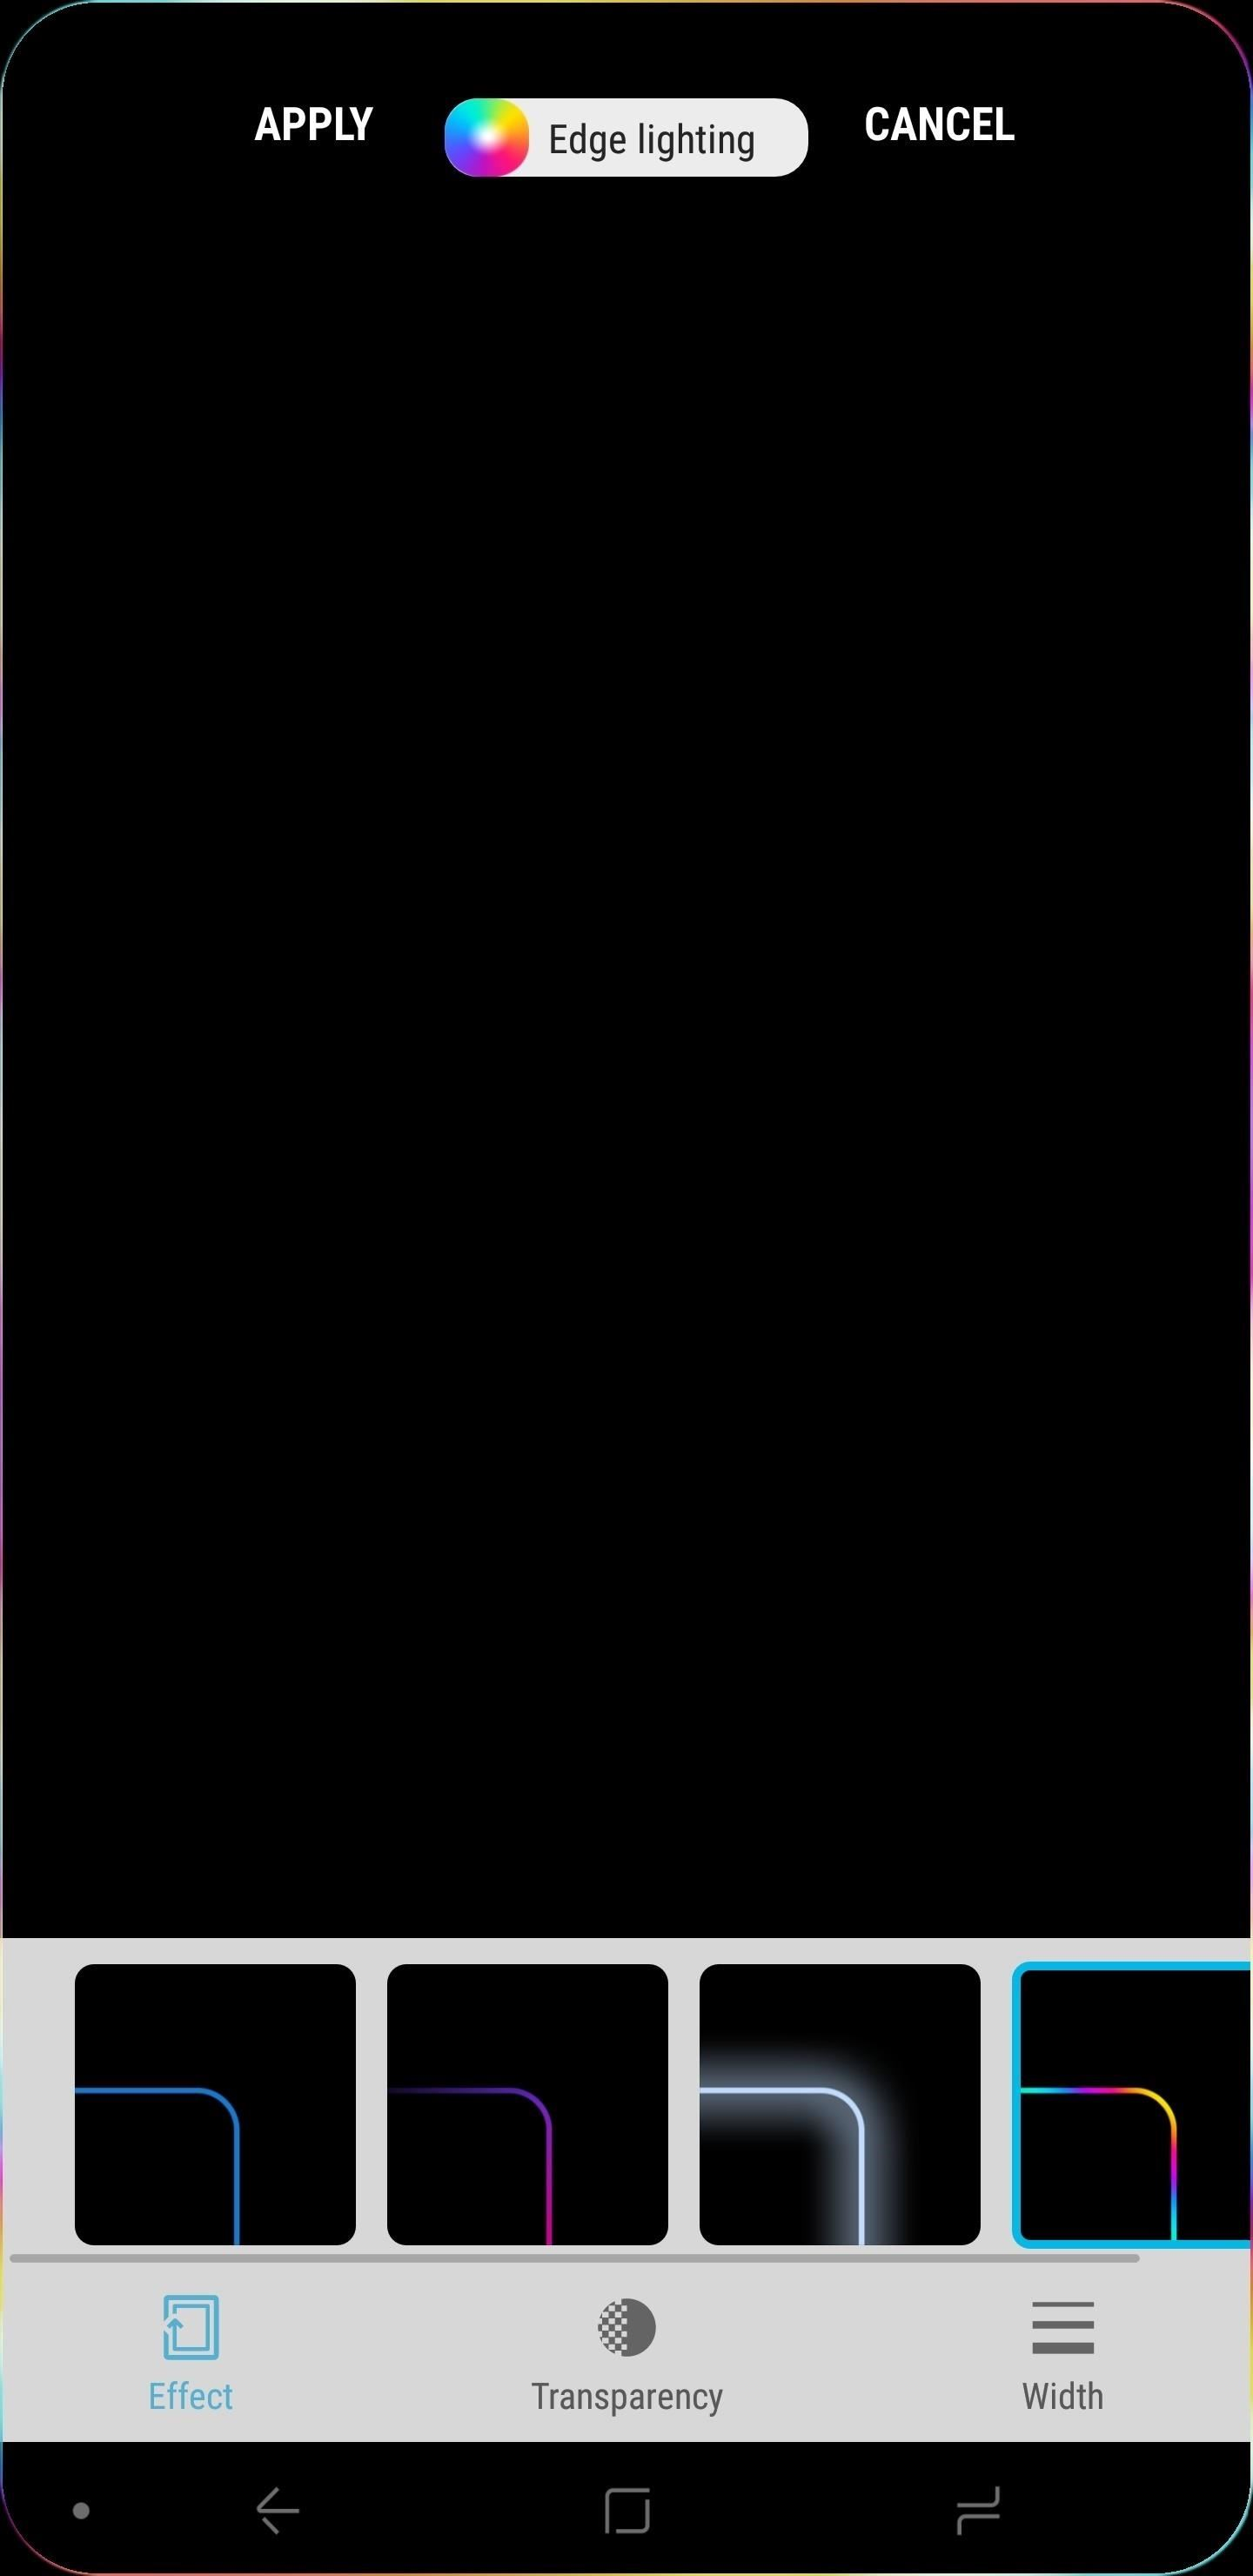 Galaxy S8 Oreo Update 1440x2960 Download Hd Wallpaper Wallpapertip